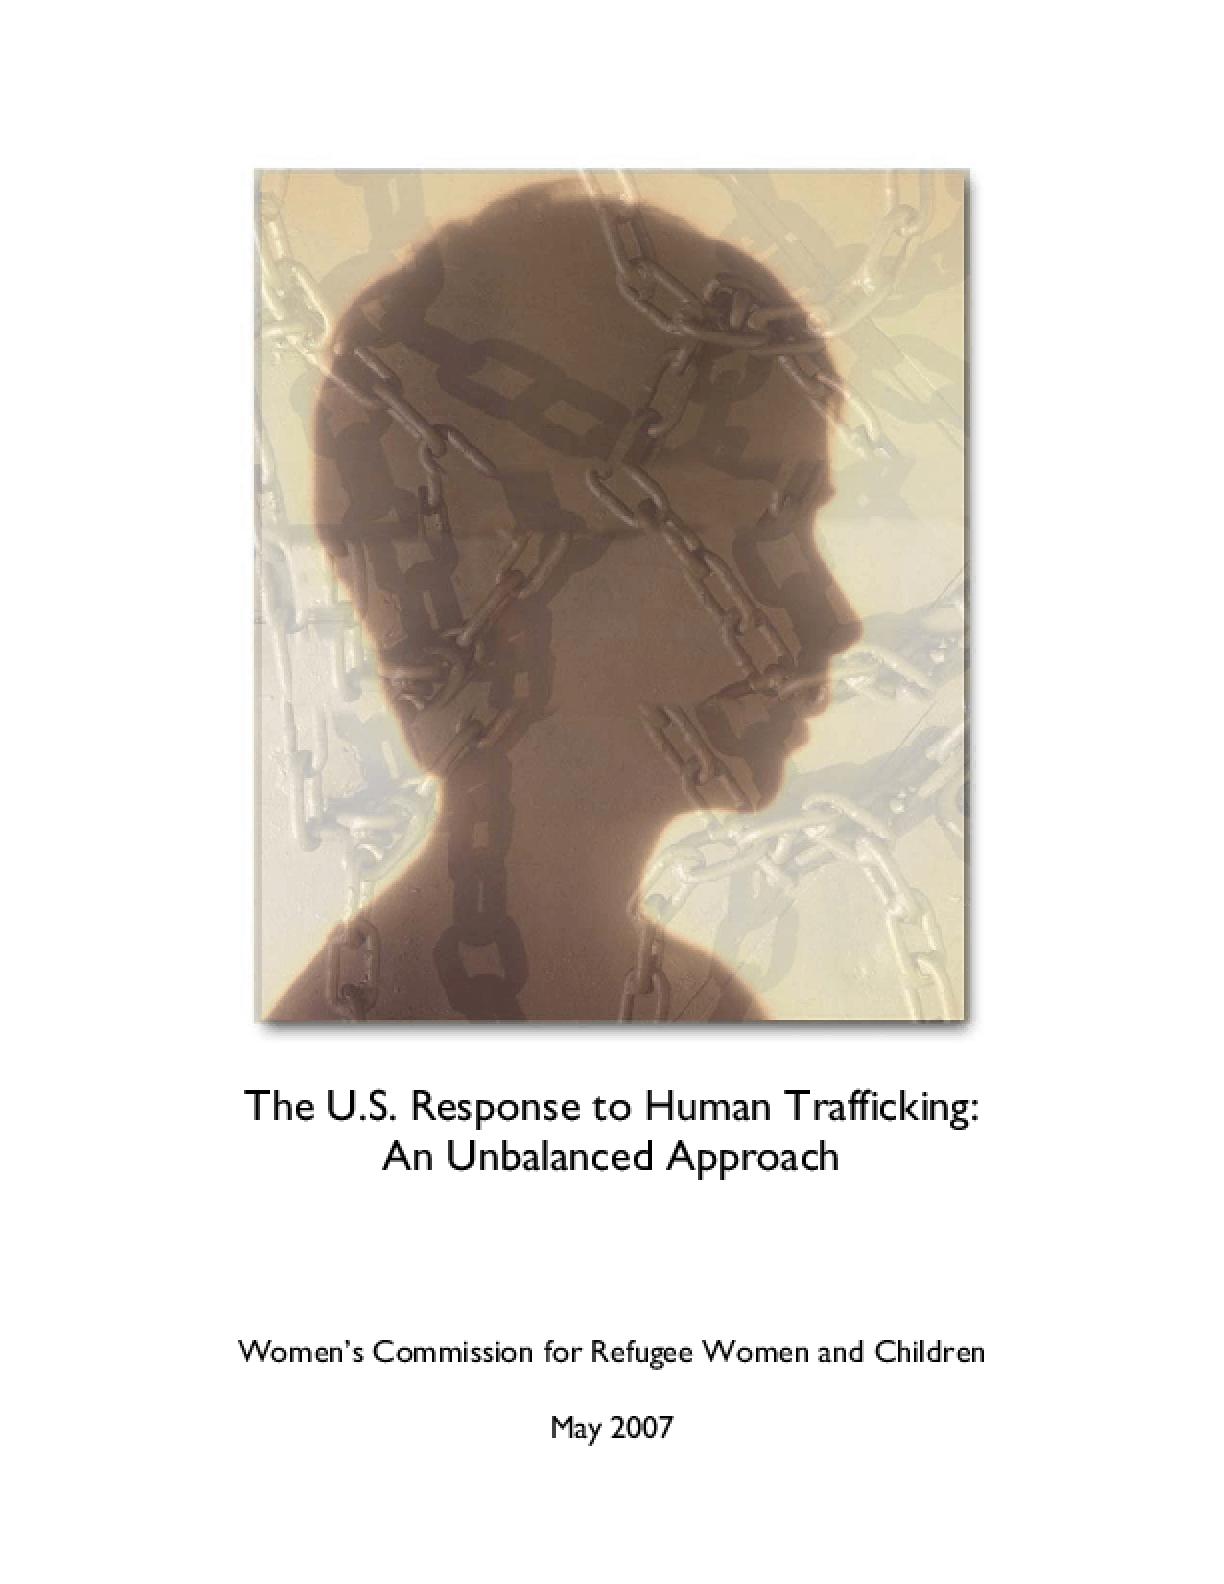 The U.S. Response to Human Trafficking: An Unbalanced Approach